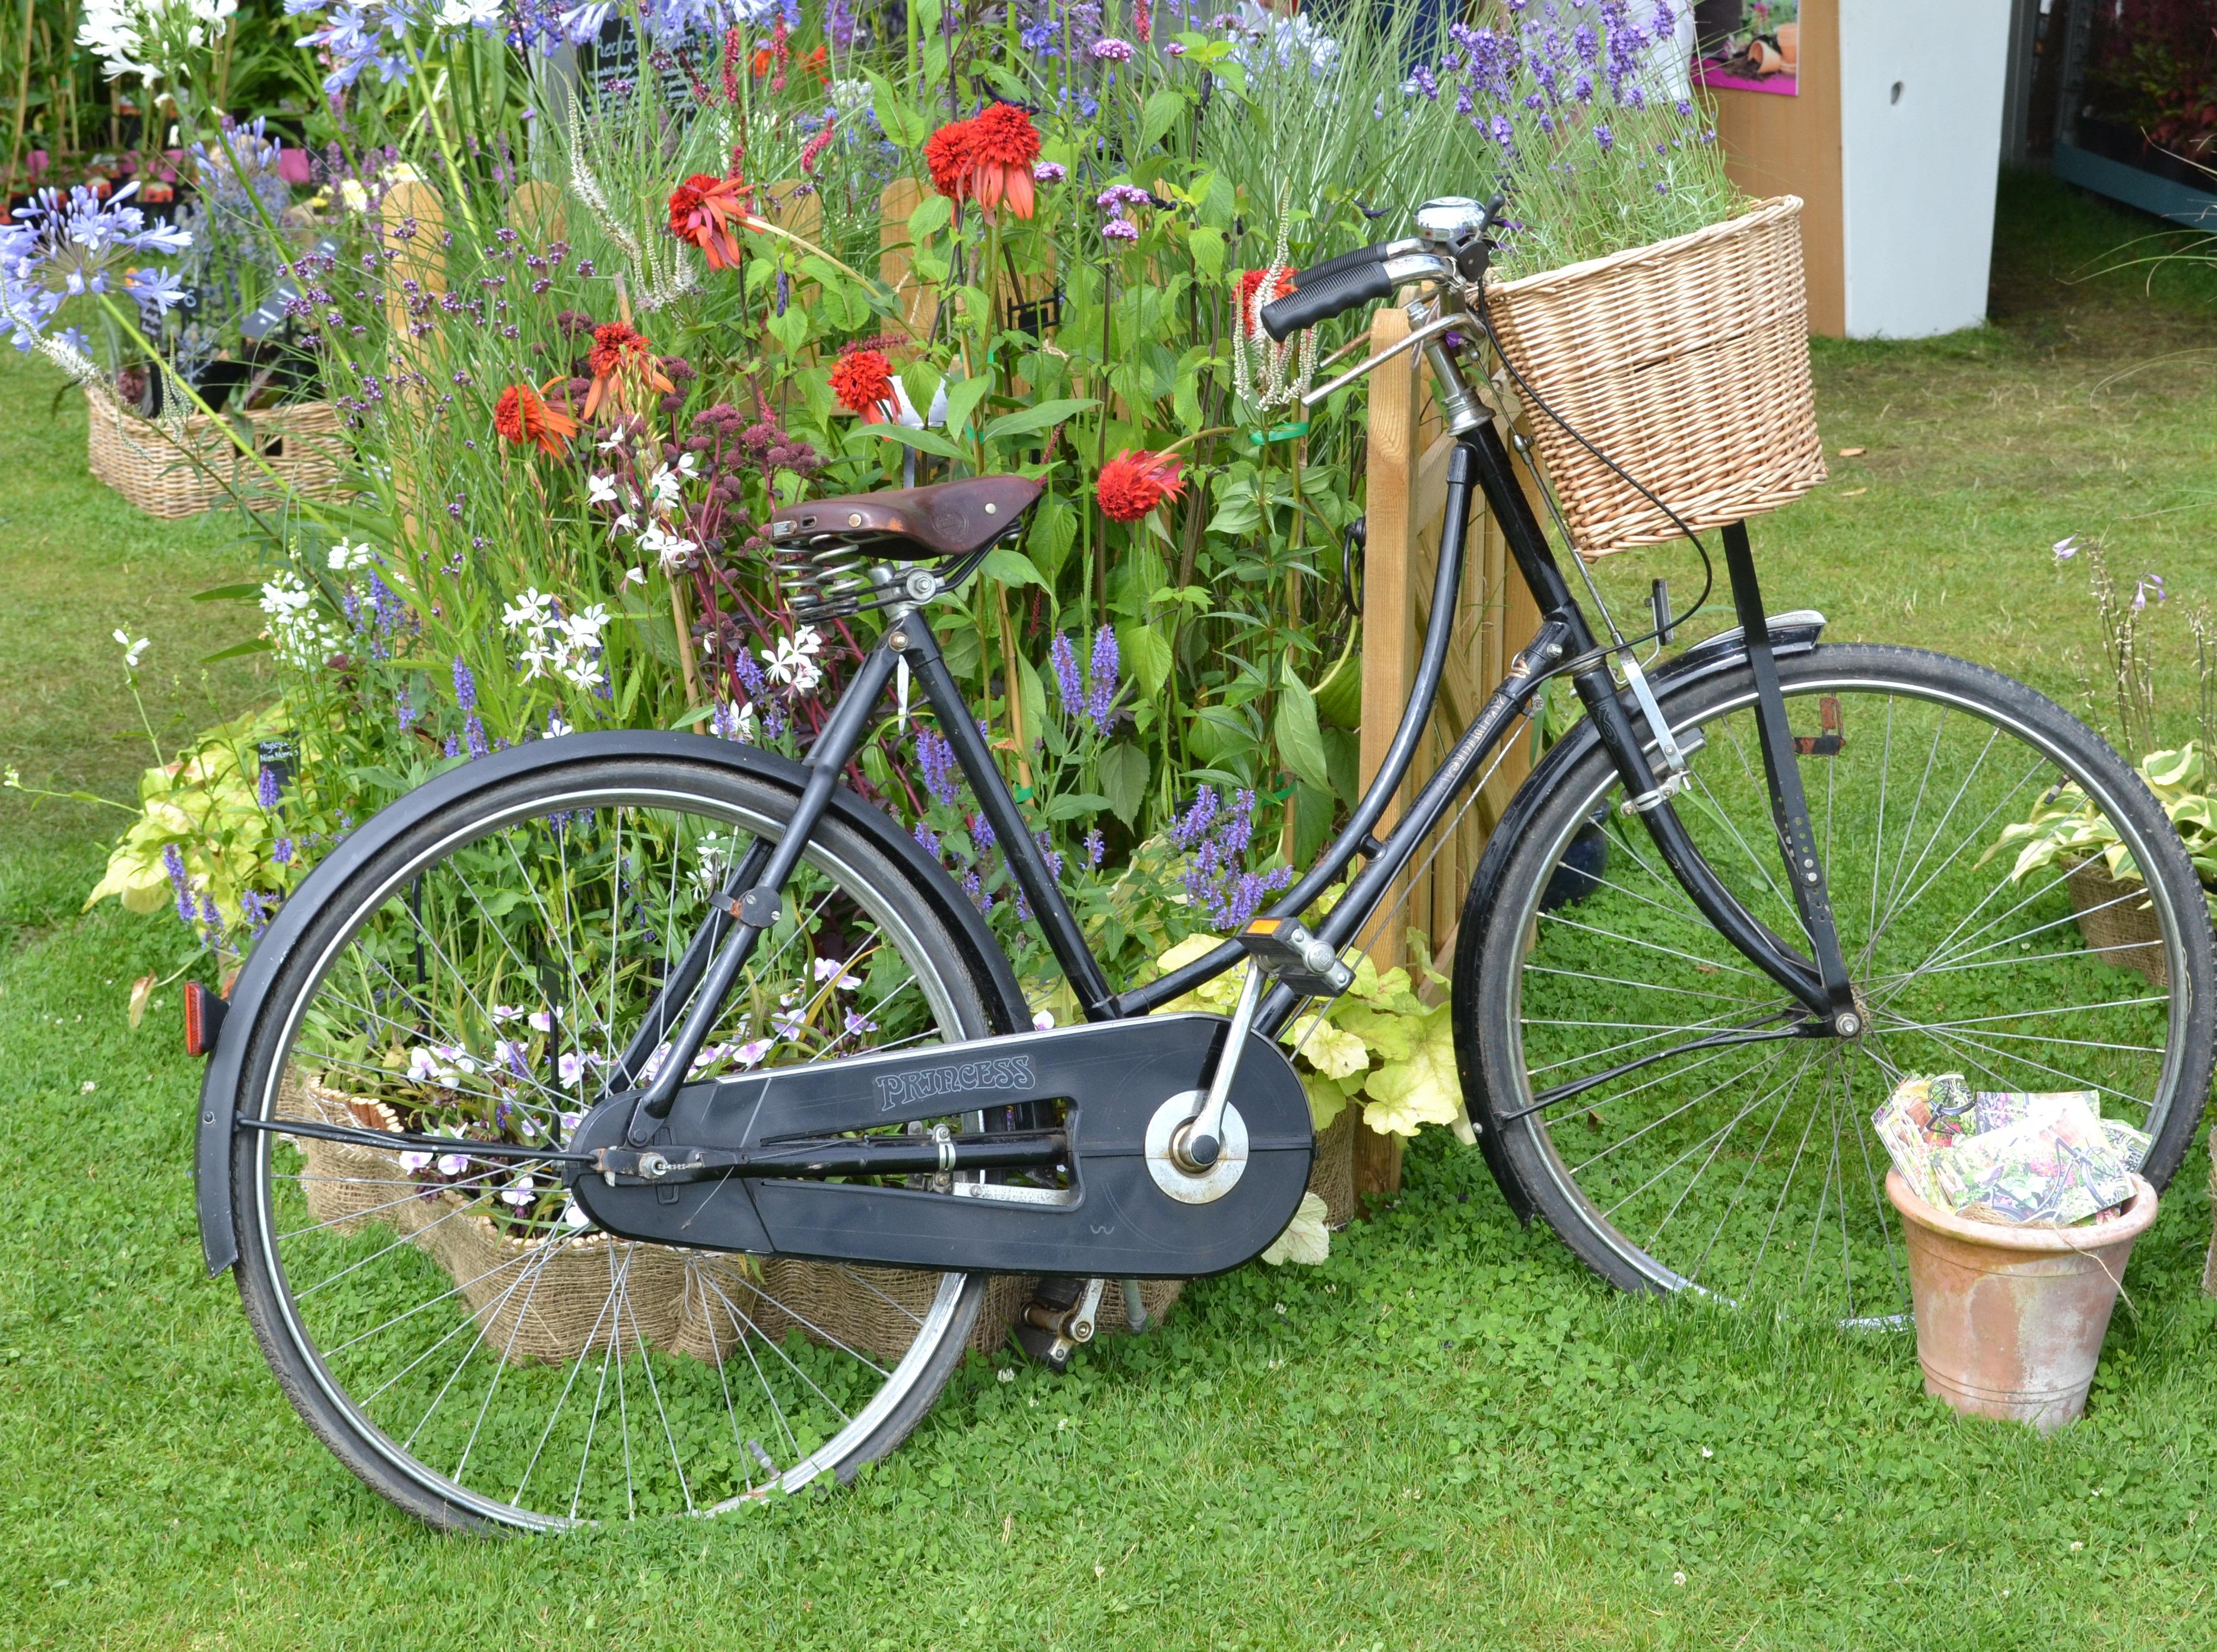 Kostenlose foto : Jahrgang, Rad, Retro, Fahrzeug, Zyklus ...